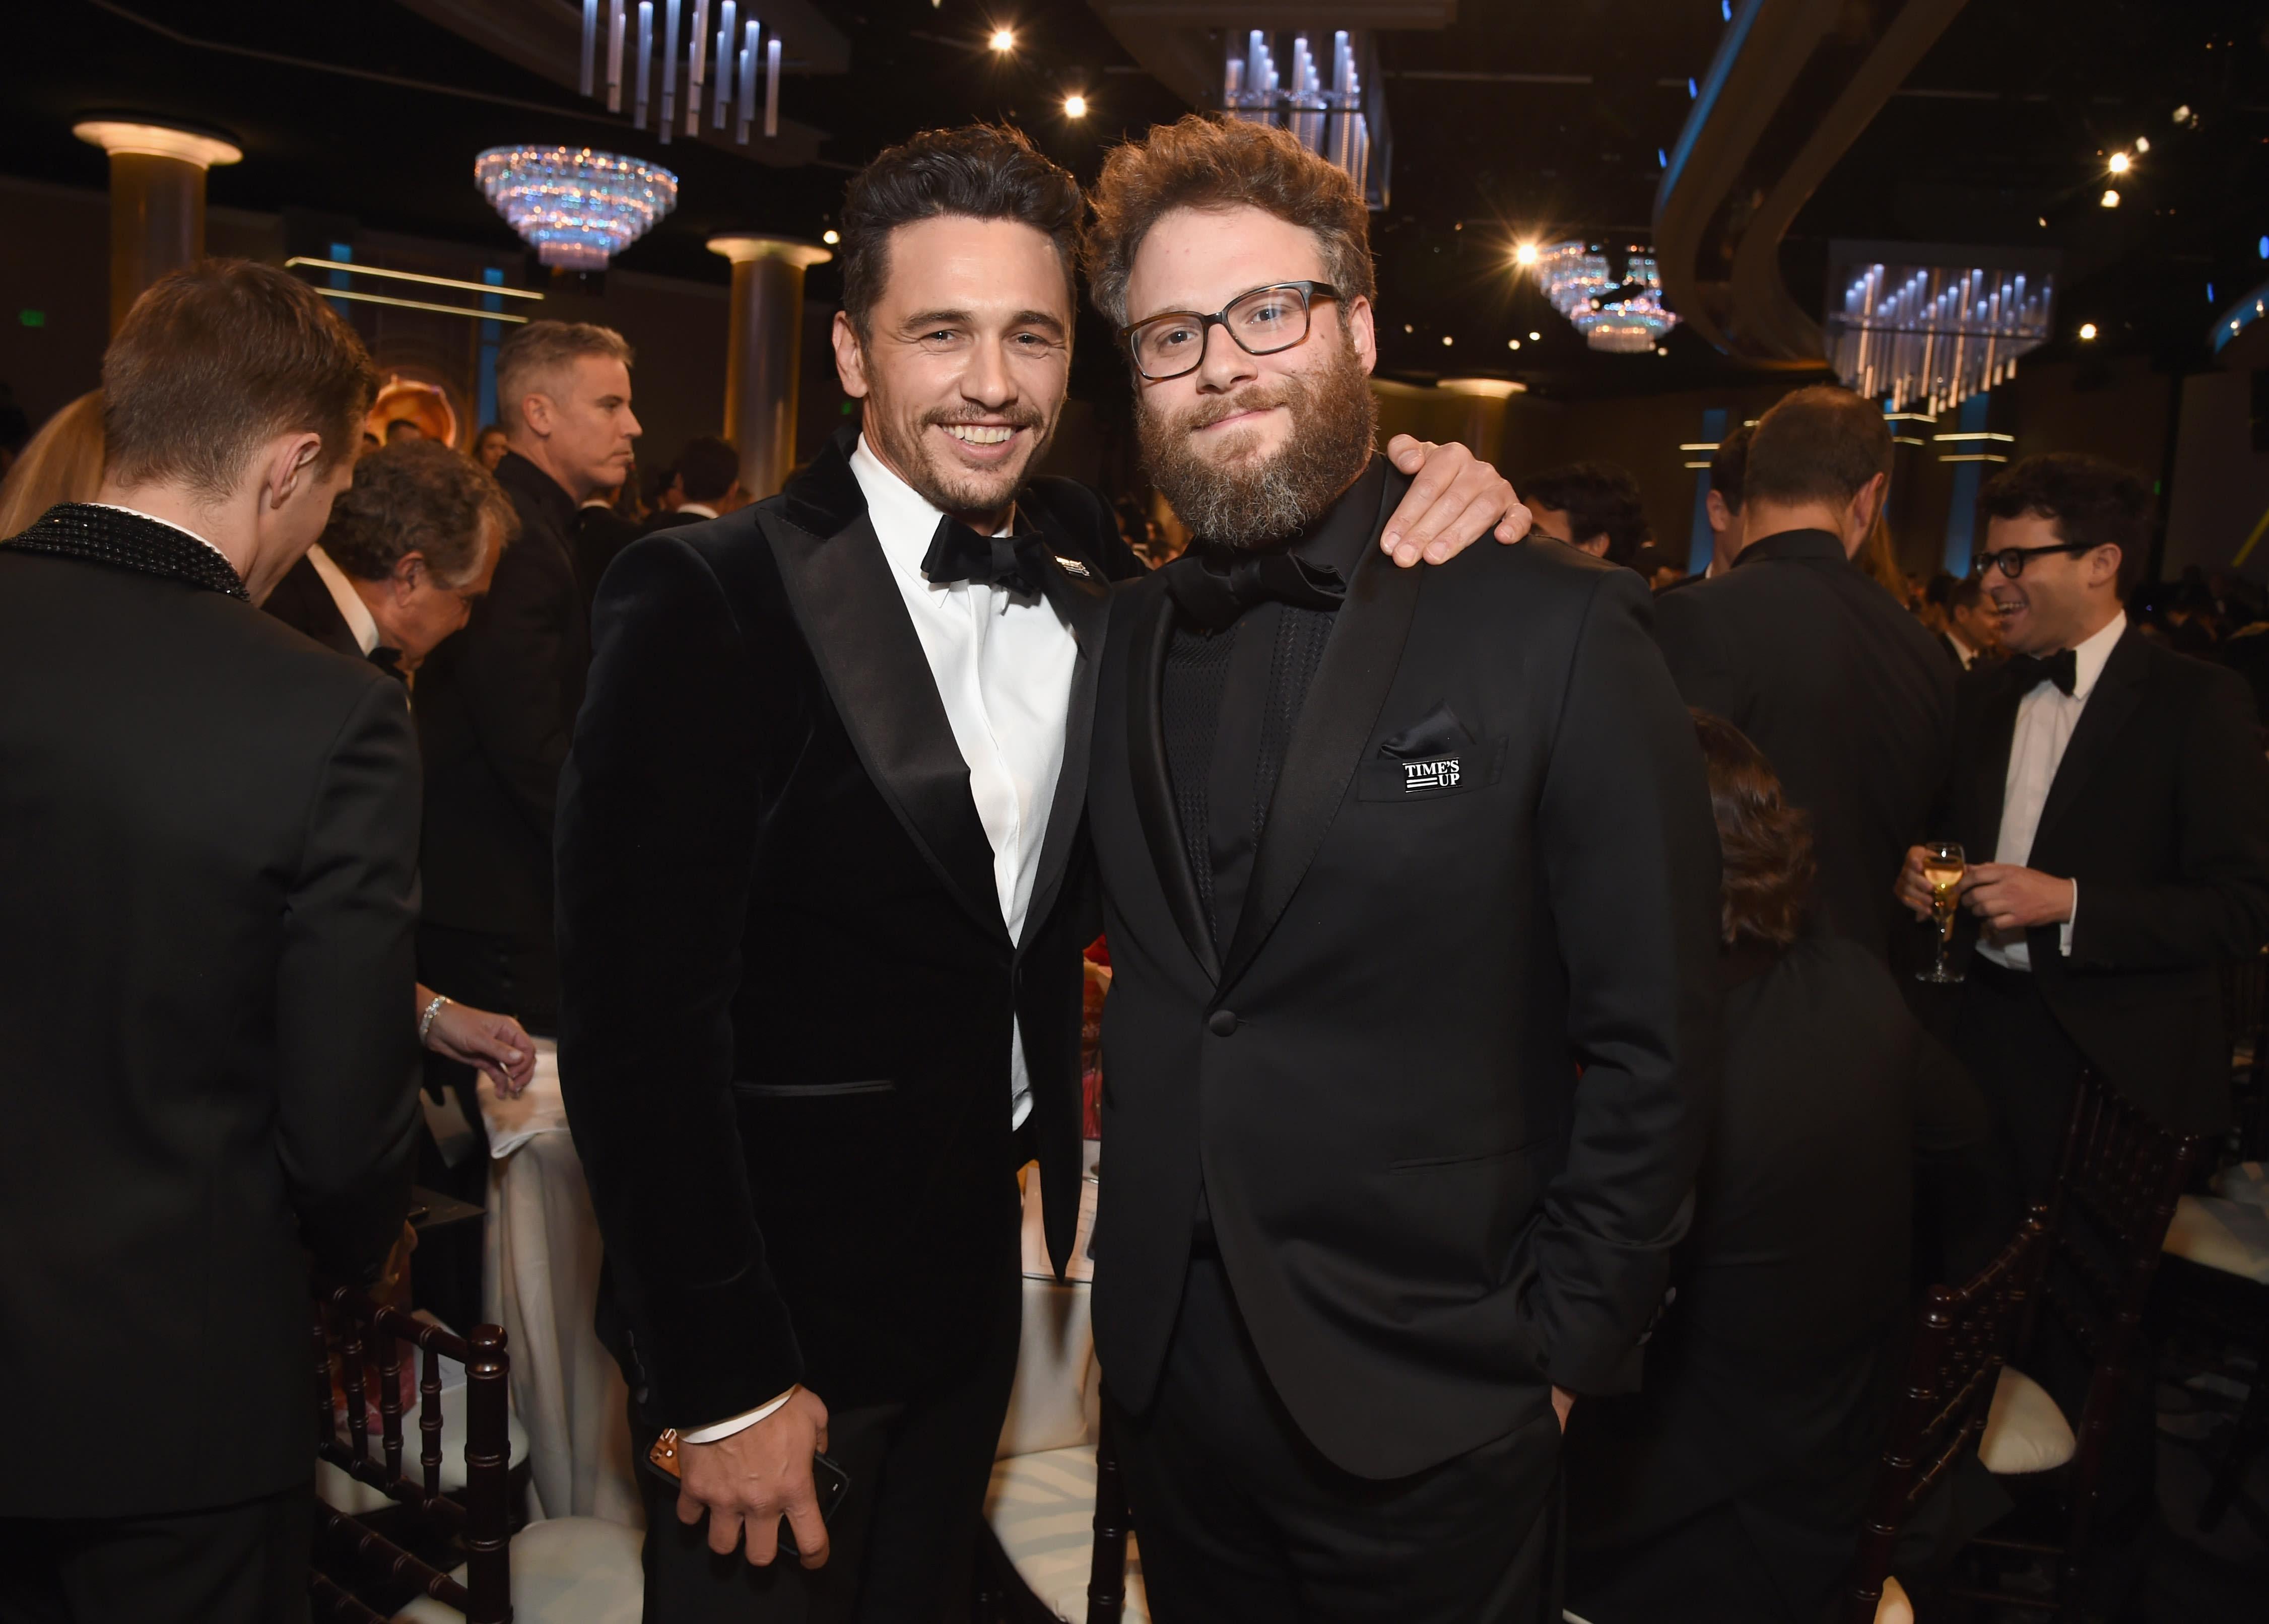 Seth Rogen and James Franco at the Golden Globes